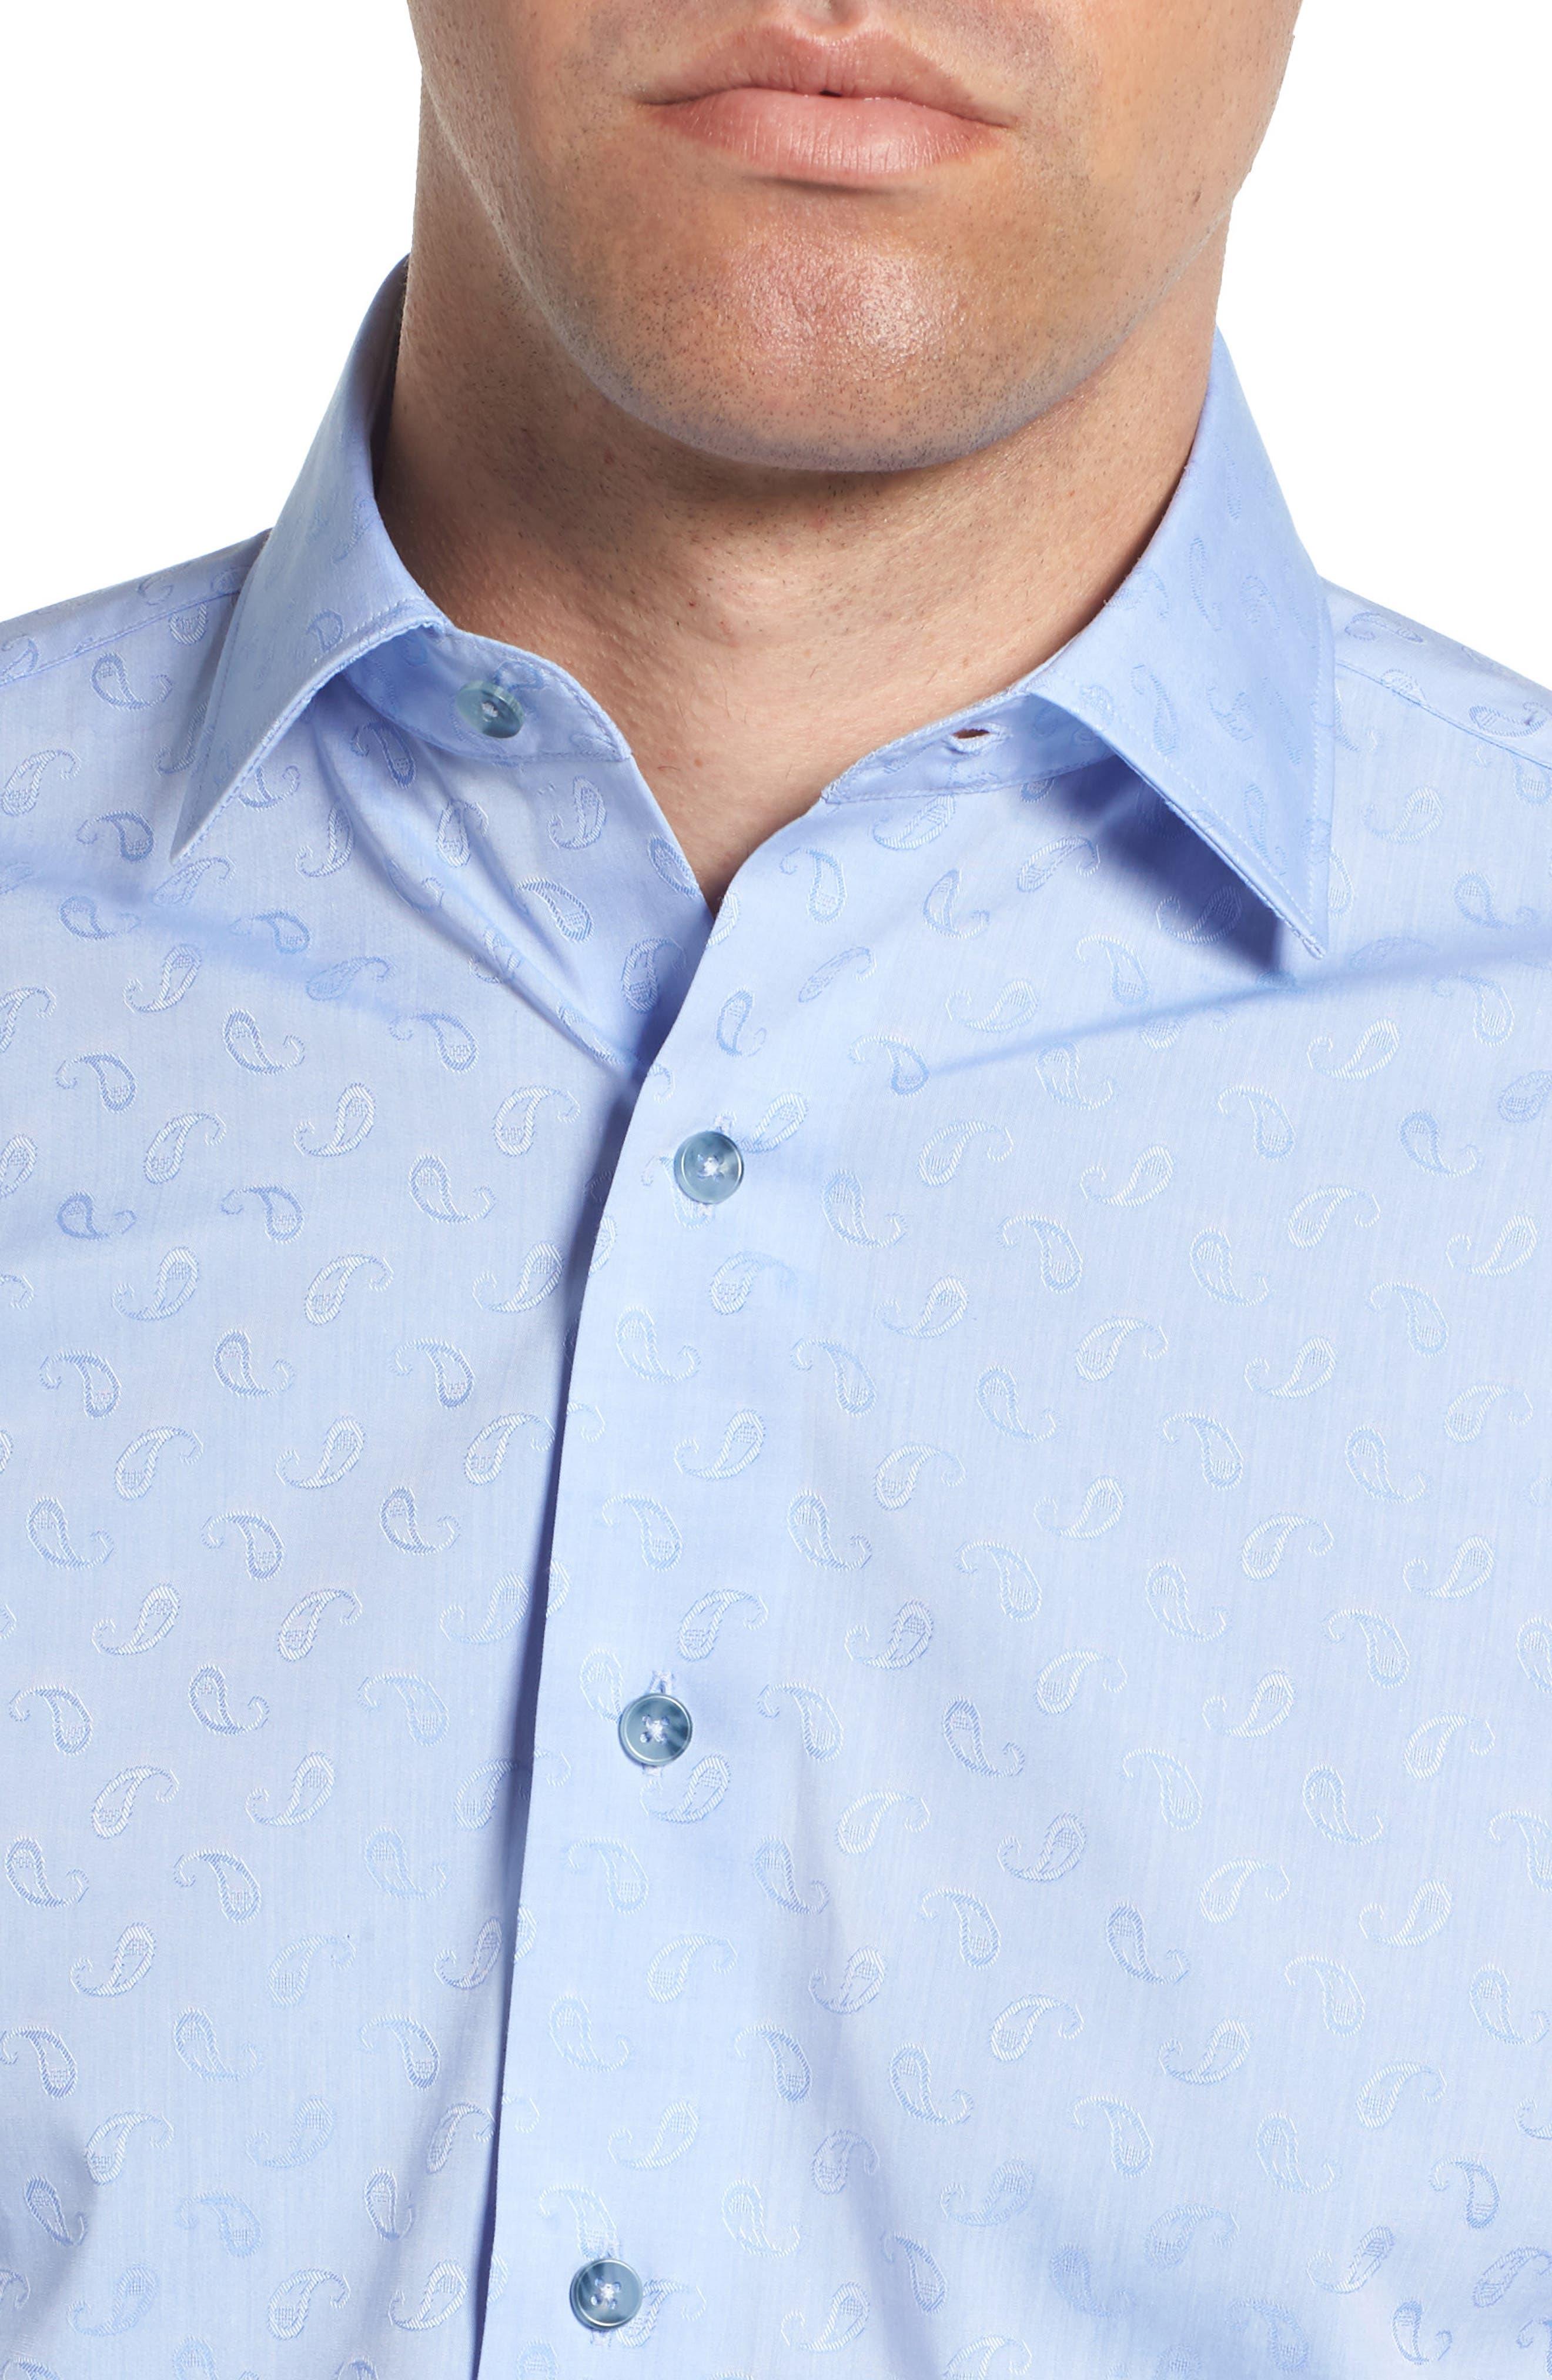 Trim Fit Paisley Dress Shirt,                             Alternate thumbnail 2, color,                             LIGHT BLUE